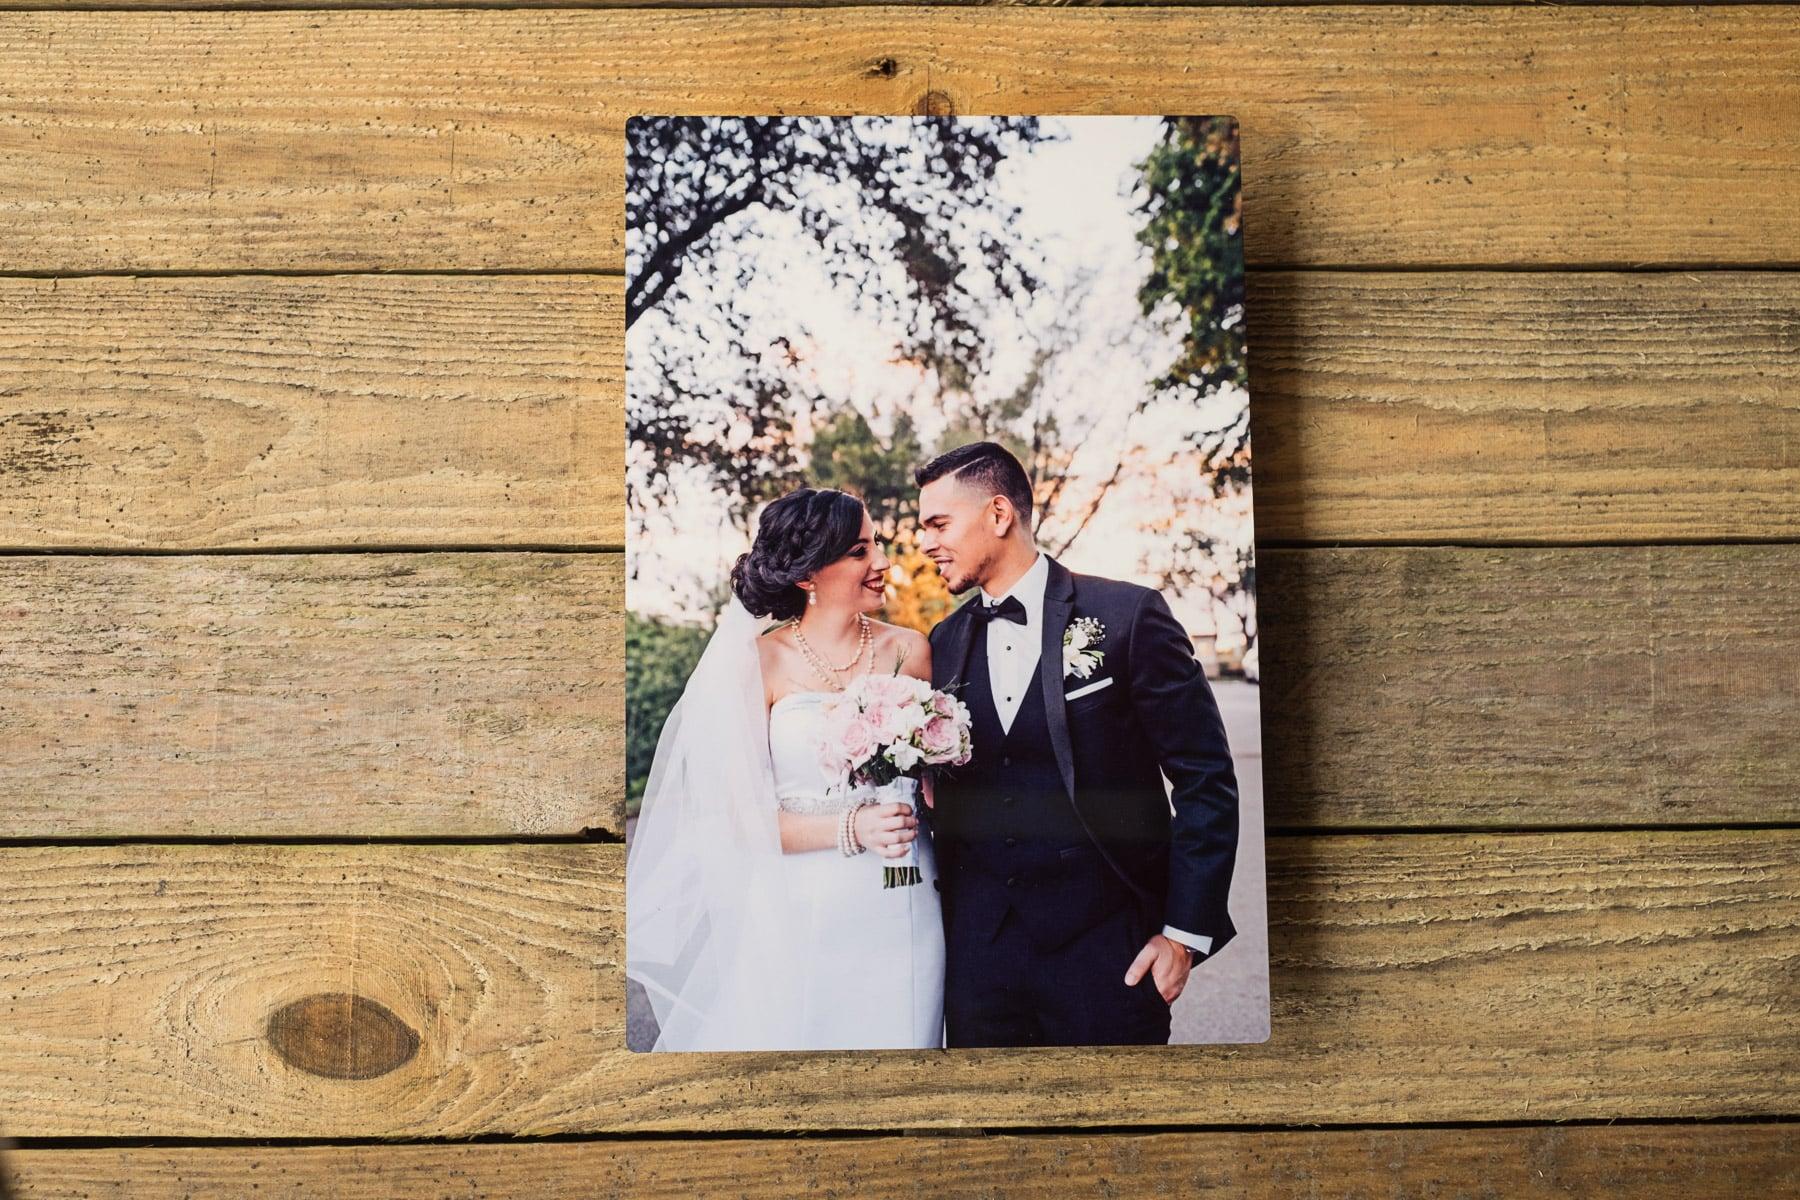 Young Miami Bride-husband-weddings-miami-metal print